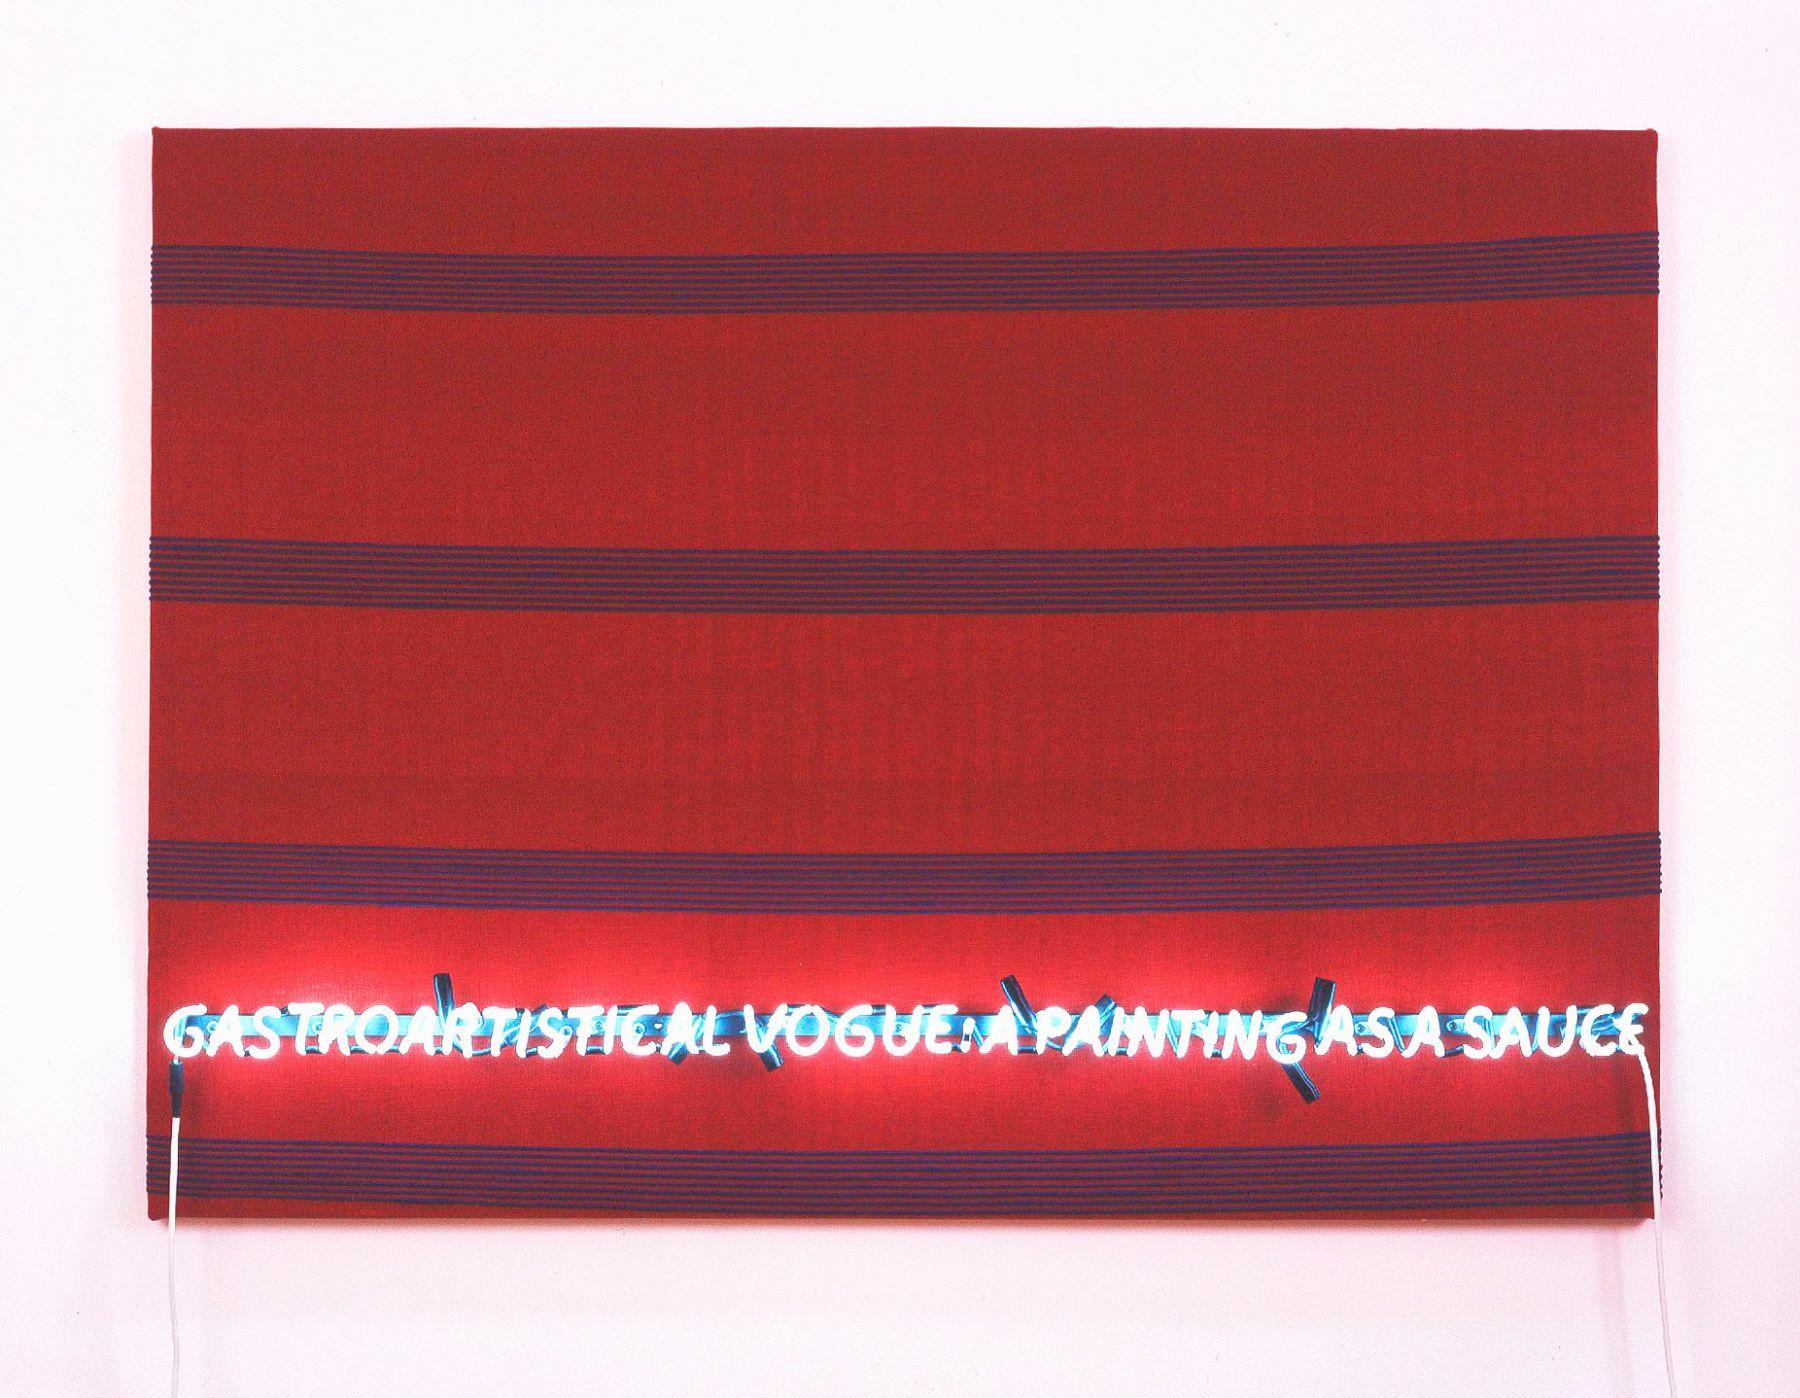 Gastroartsitical vogue: a painting as a souce